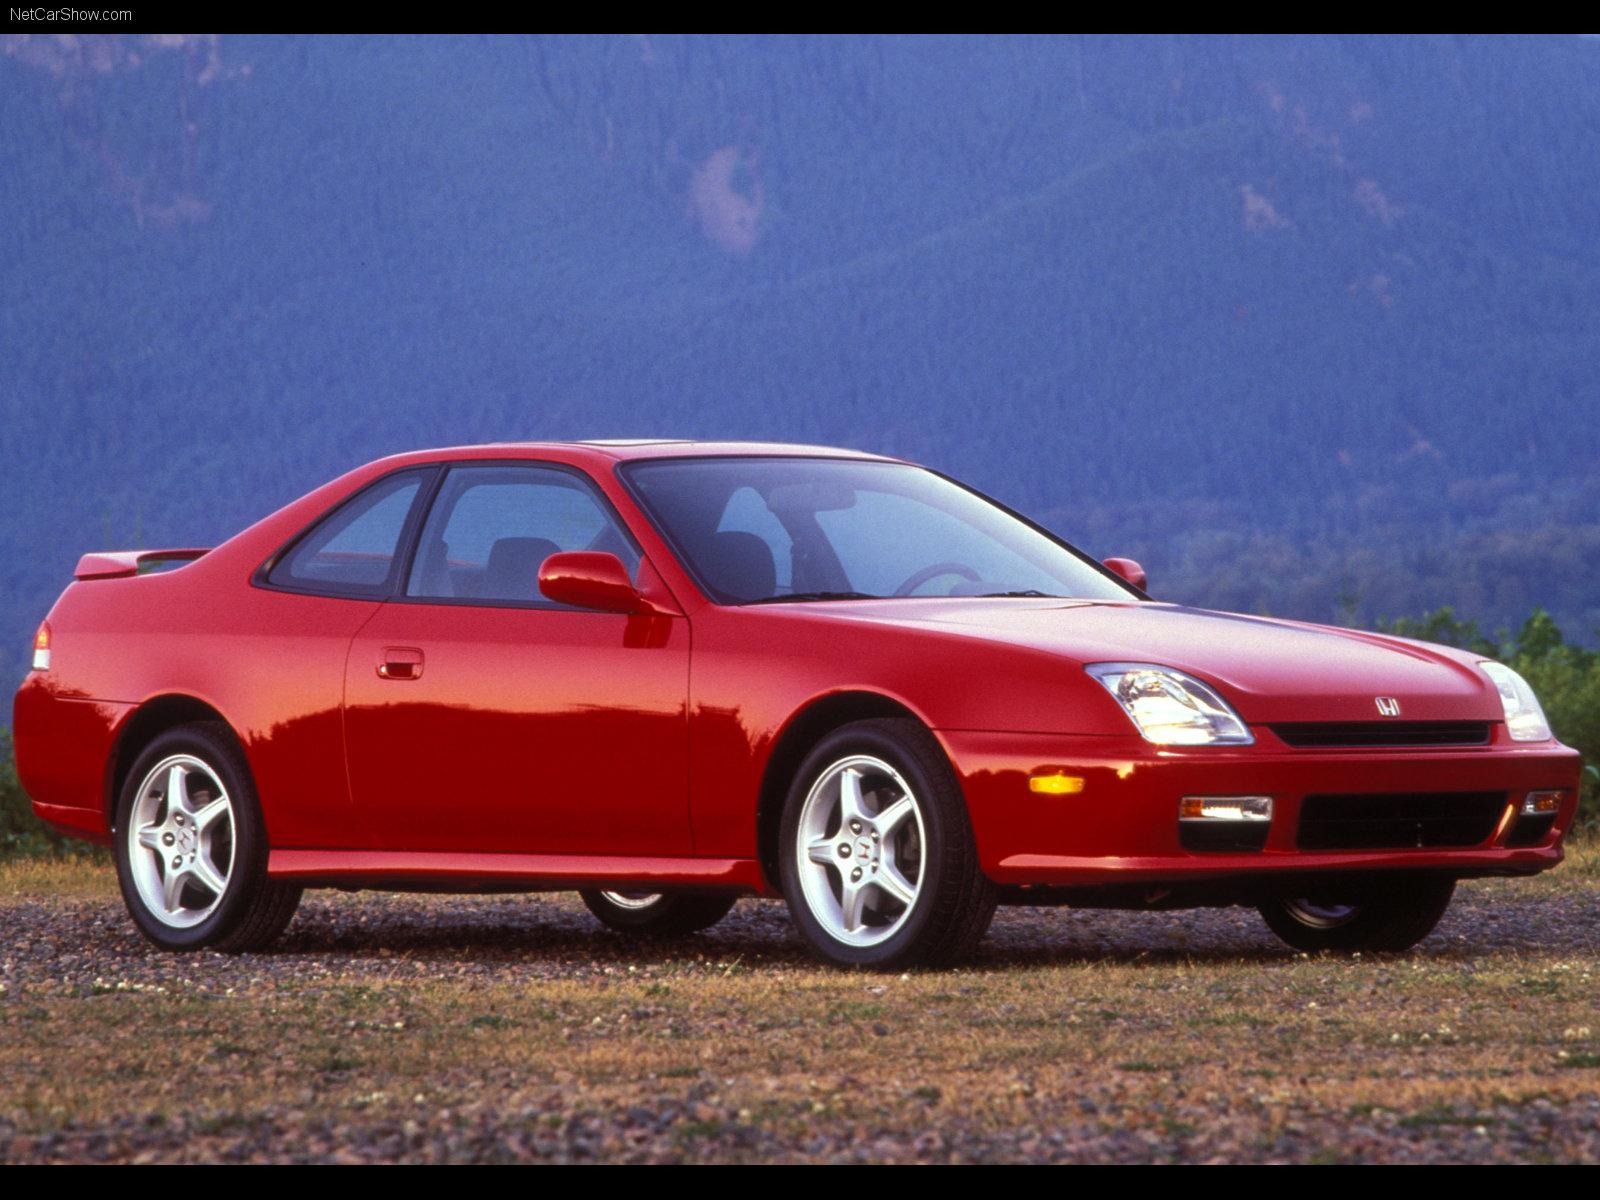 Honda Prelude SiR Coupe 2000